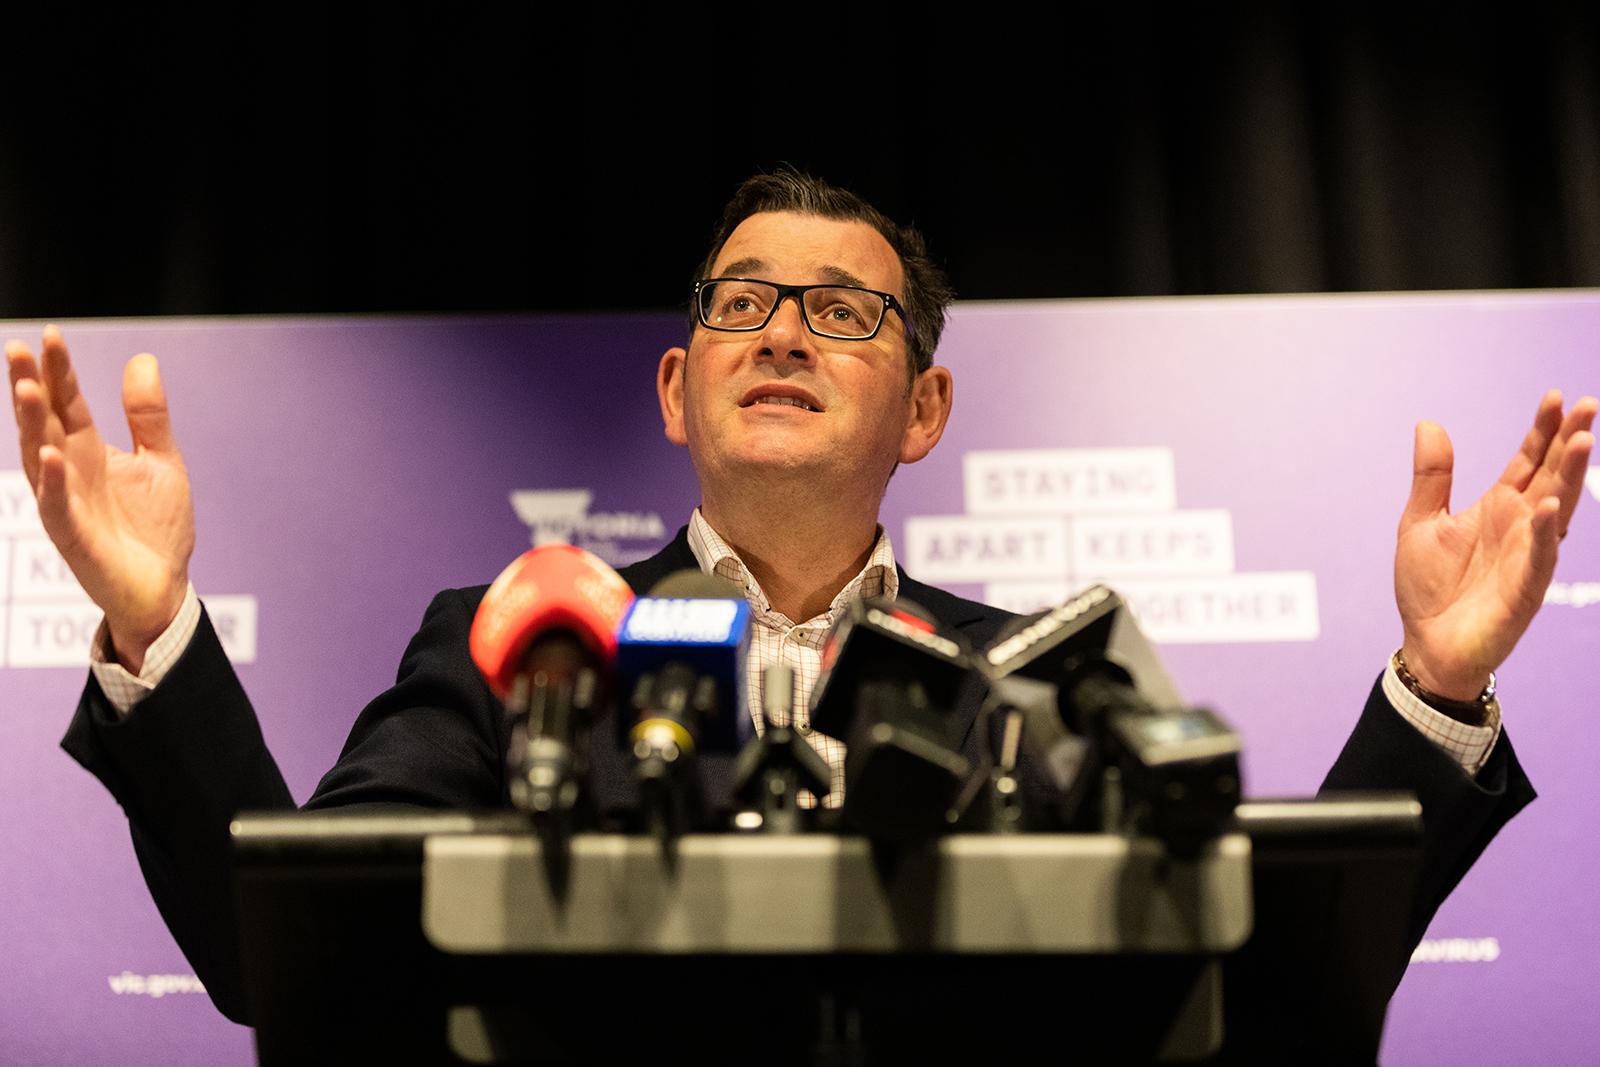 Victoria Premier Daniel Andrews speaks during a press conference on July 4, in Melbourne, Australia.